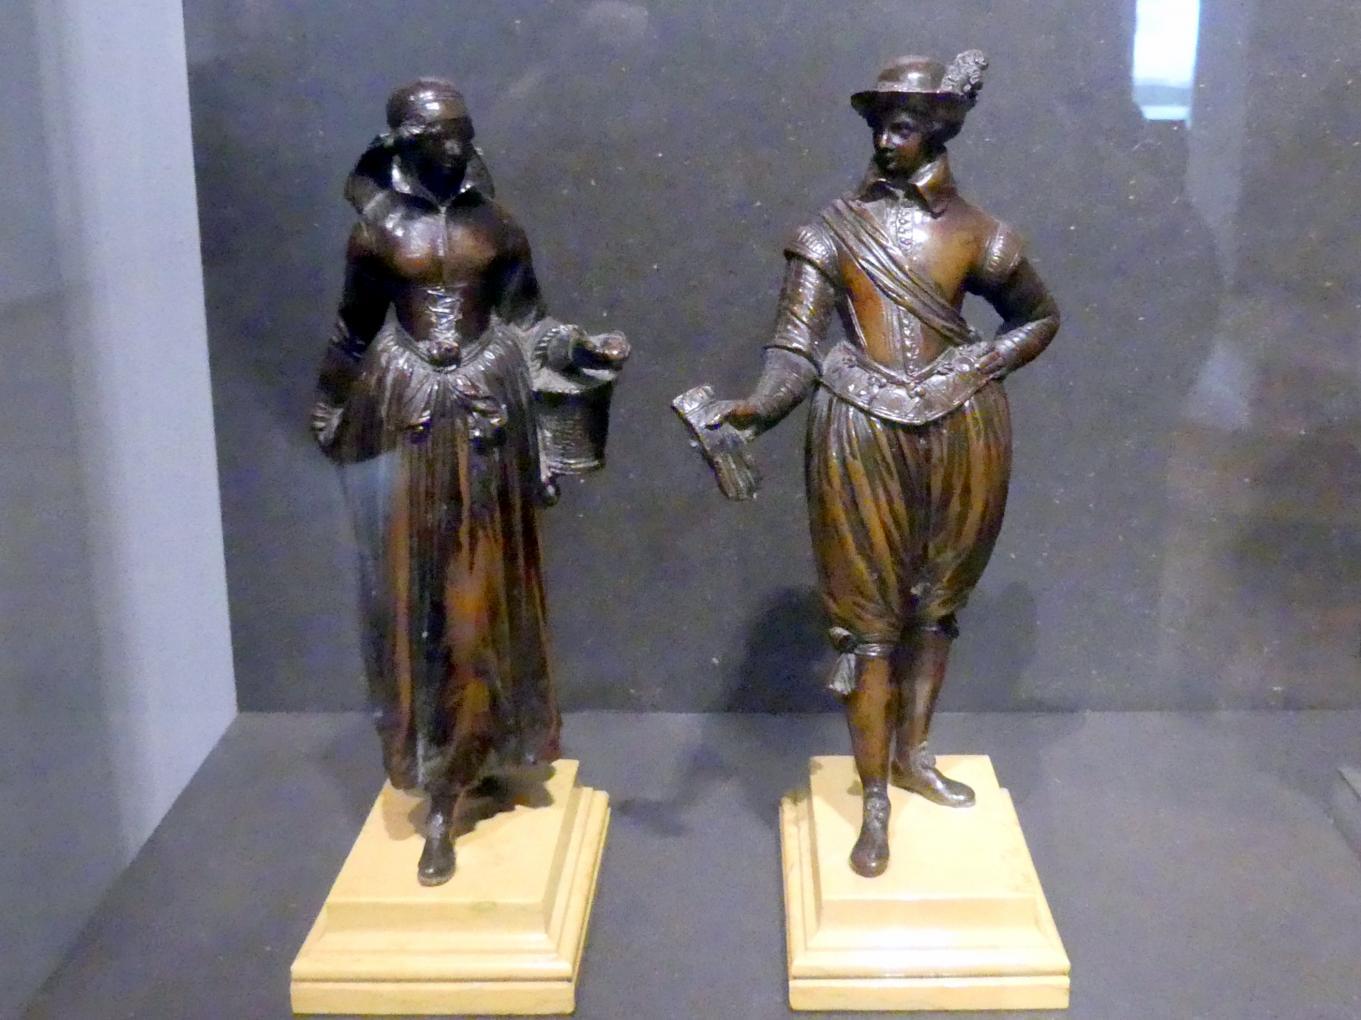 Barthélemy Prieur: Magd und Kavalier, Um 1600